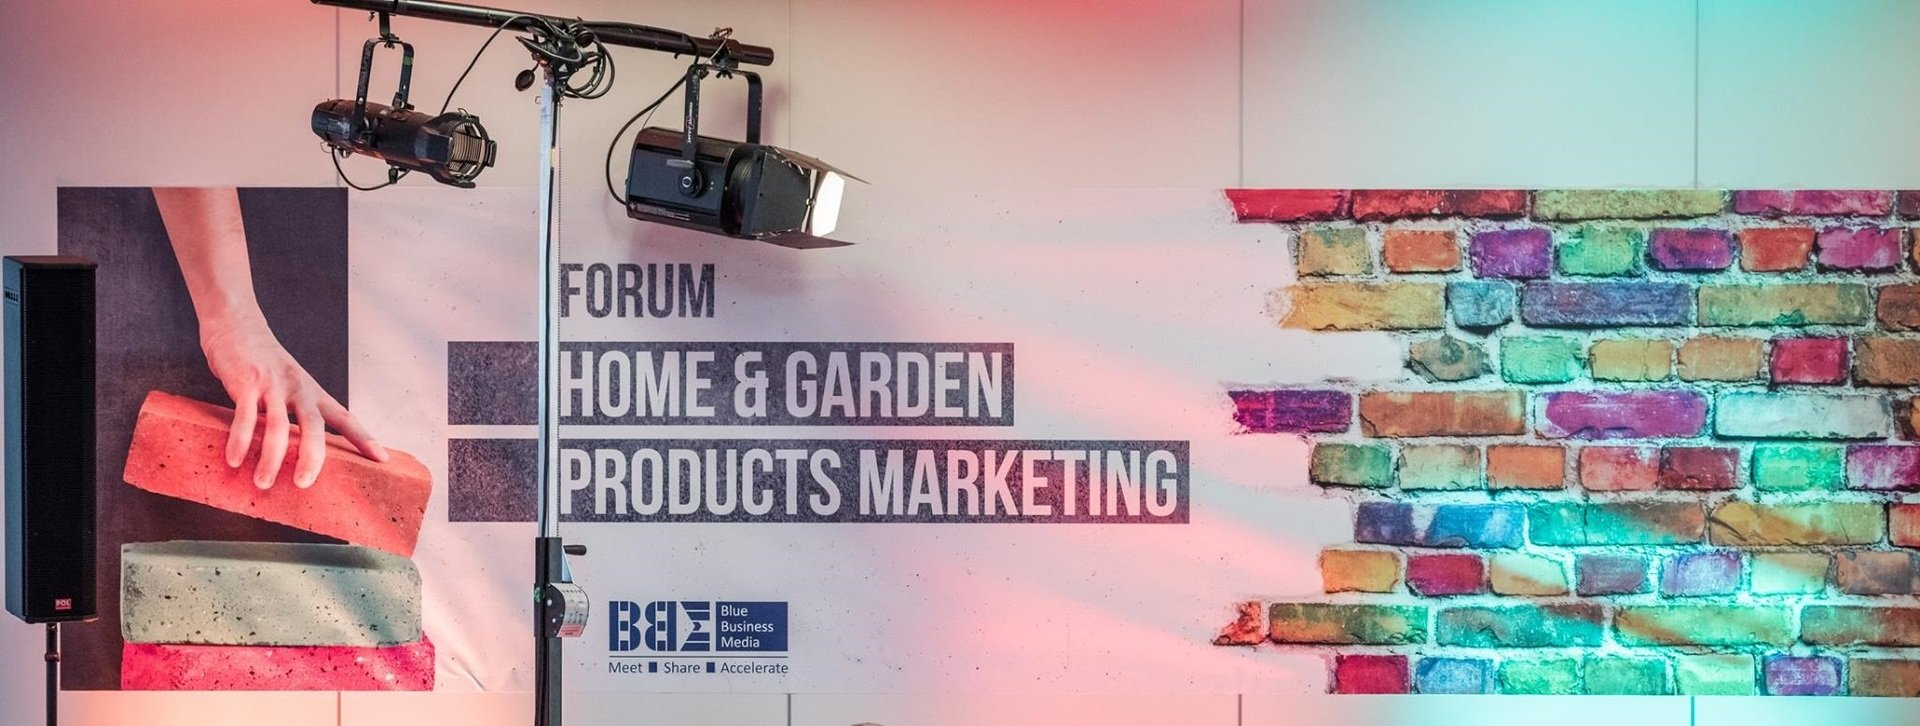 Forum HOME & GARDEN PRODUCTS MARKETING - Homebook Partnerem